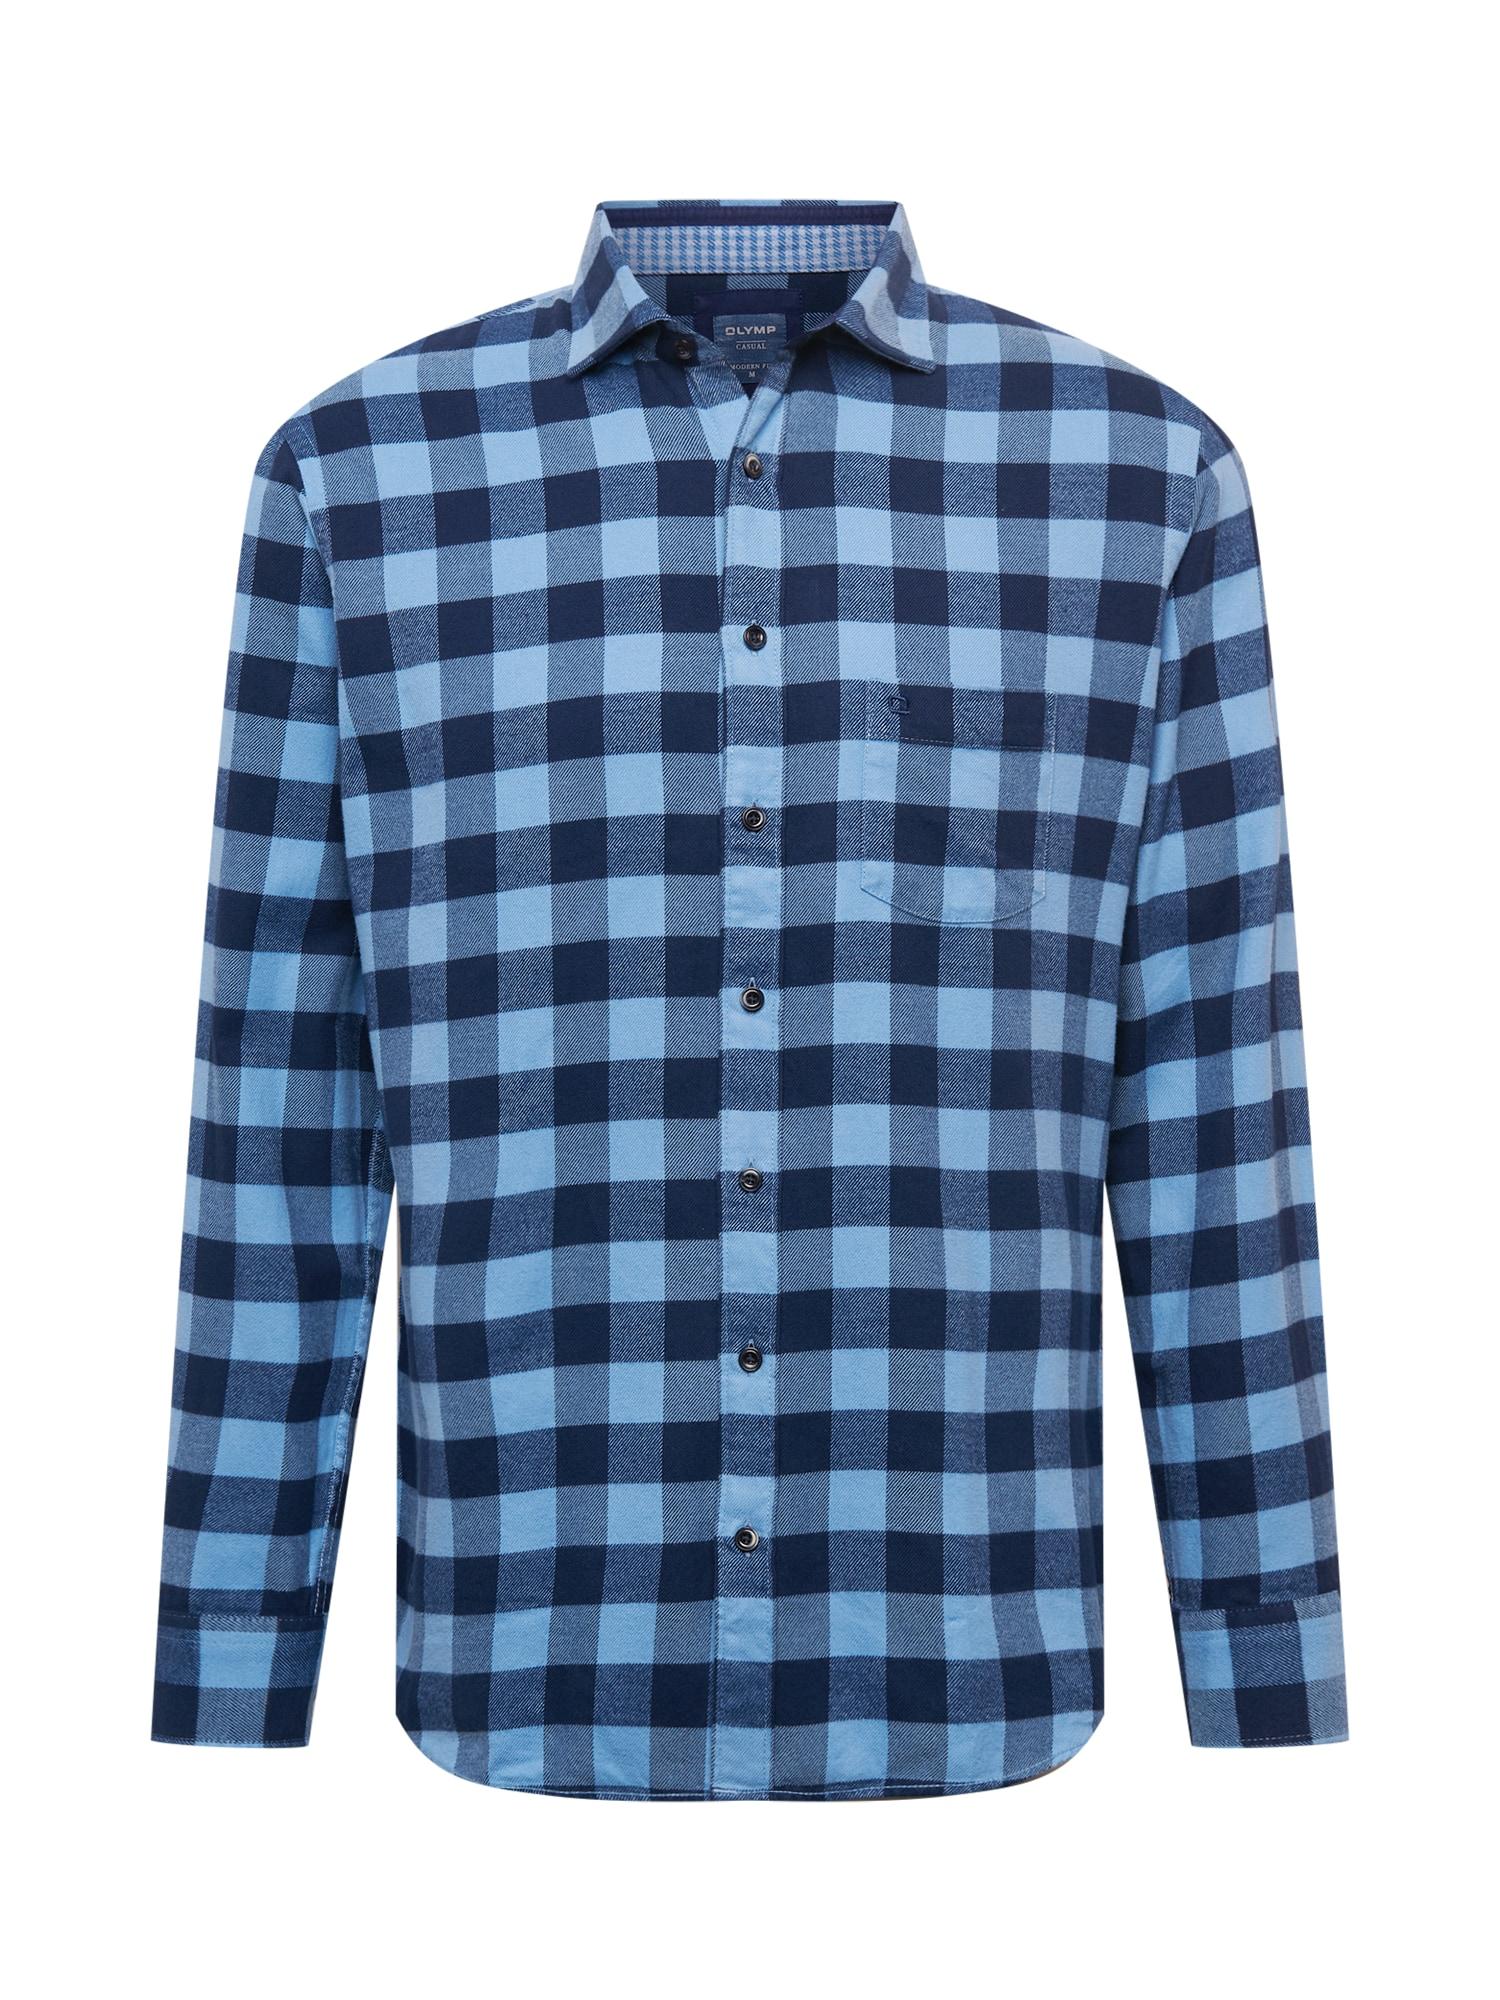 OLYMP Košile  modrá / tmavě modrá / světlemodrá